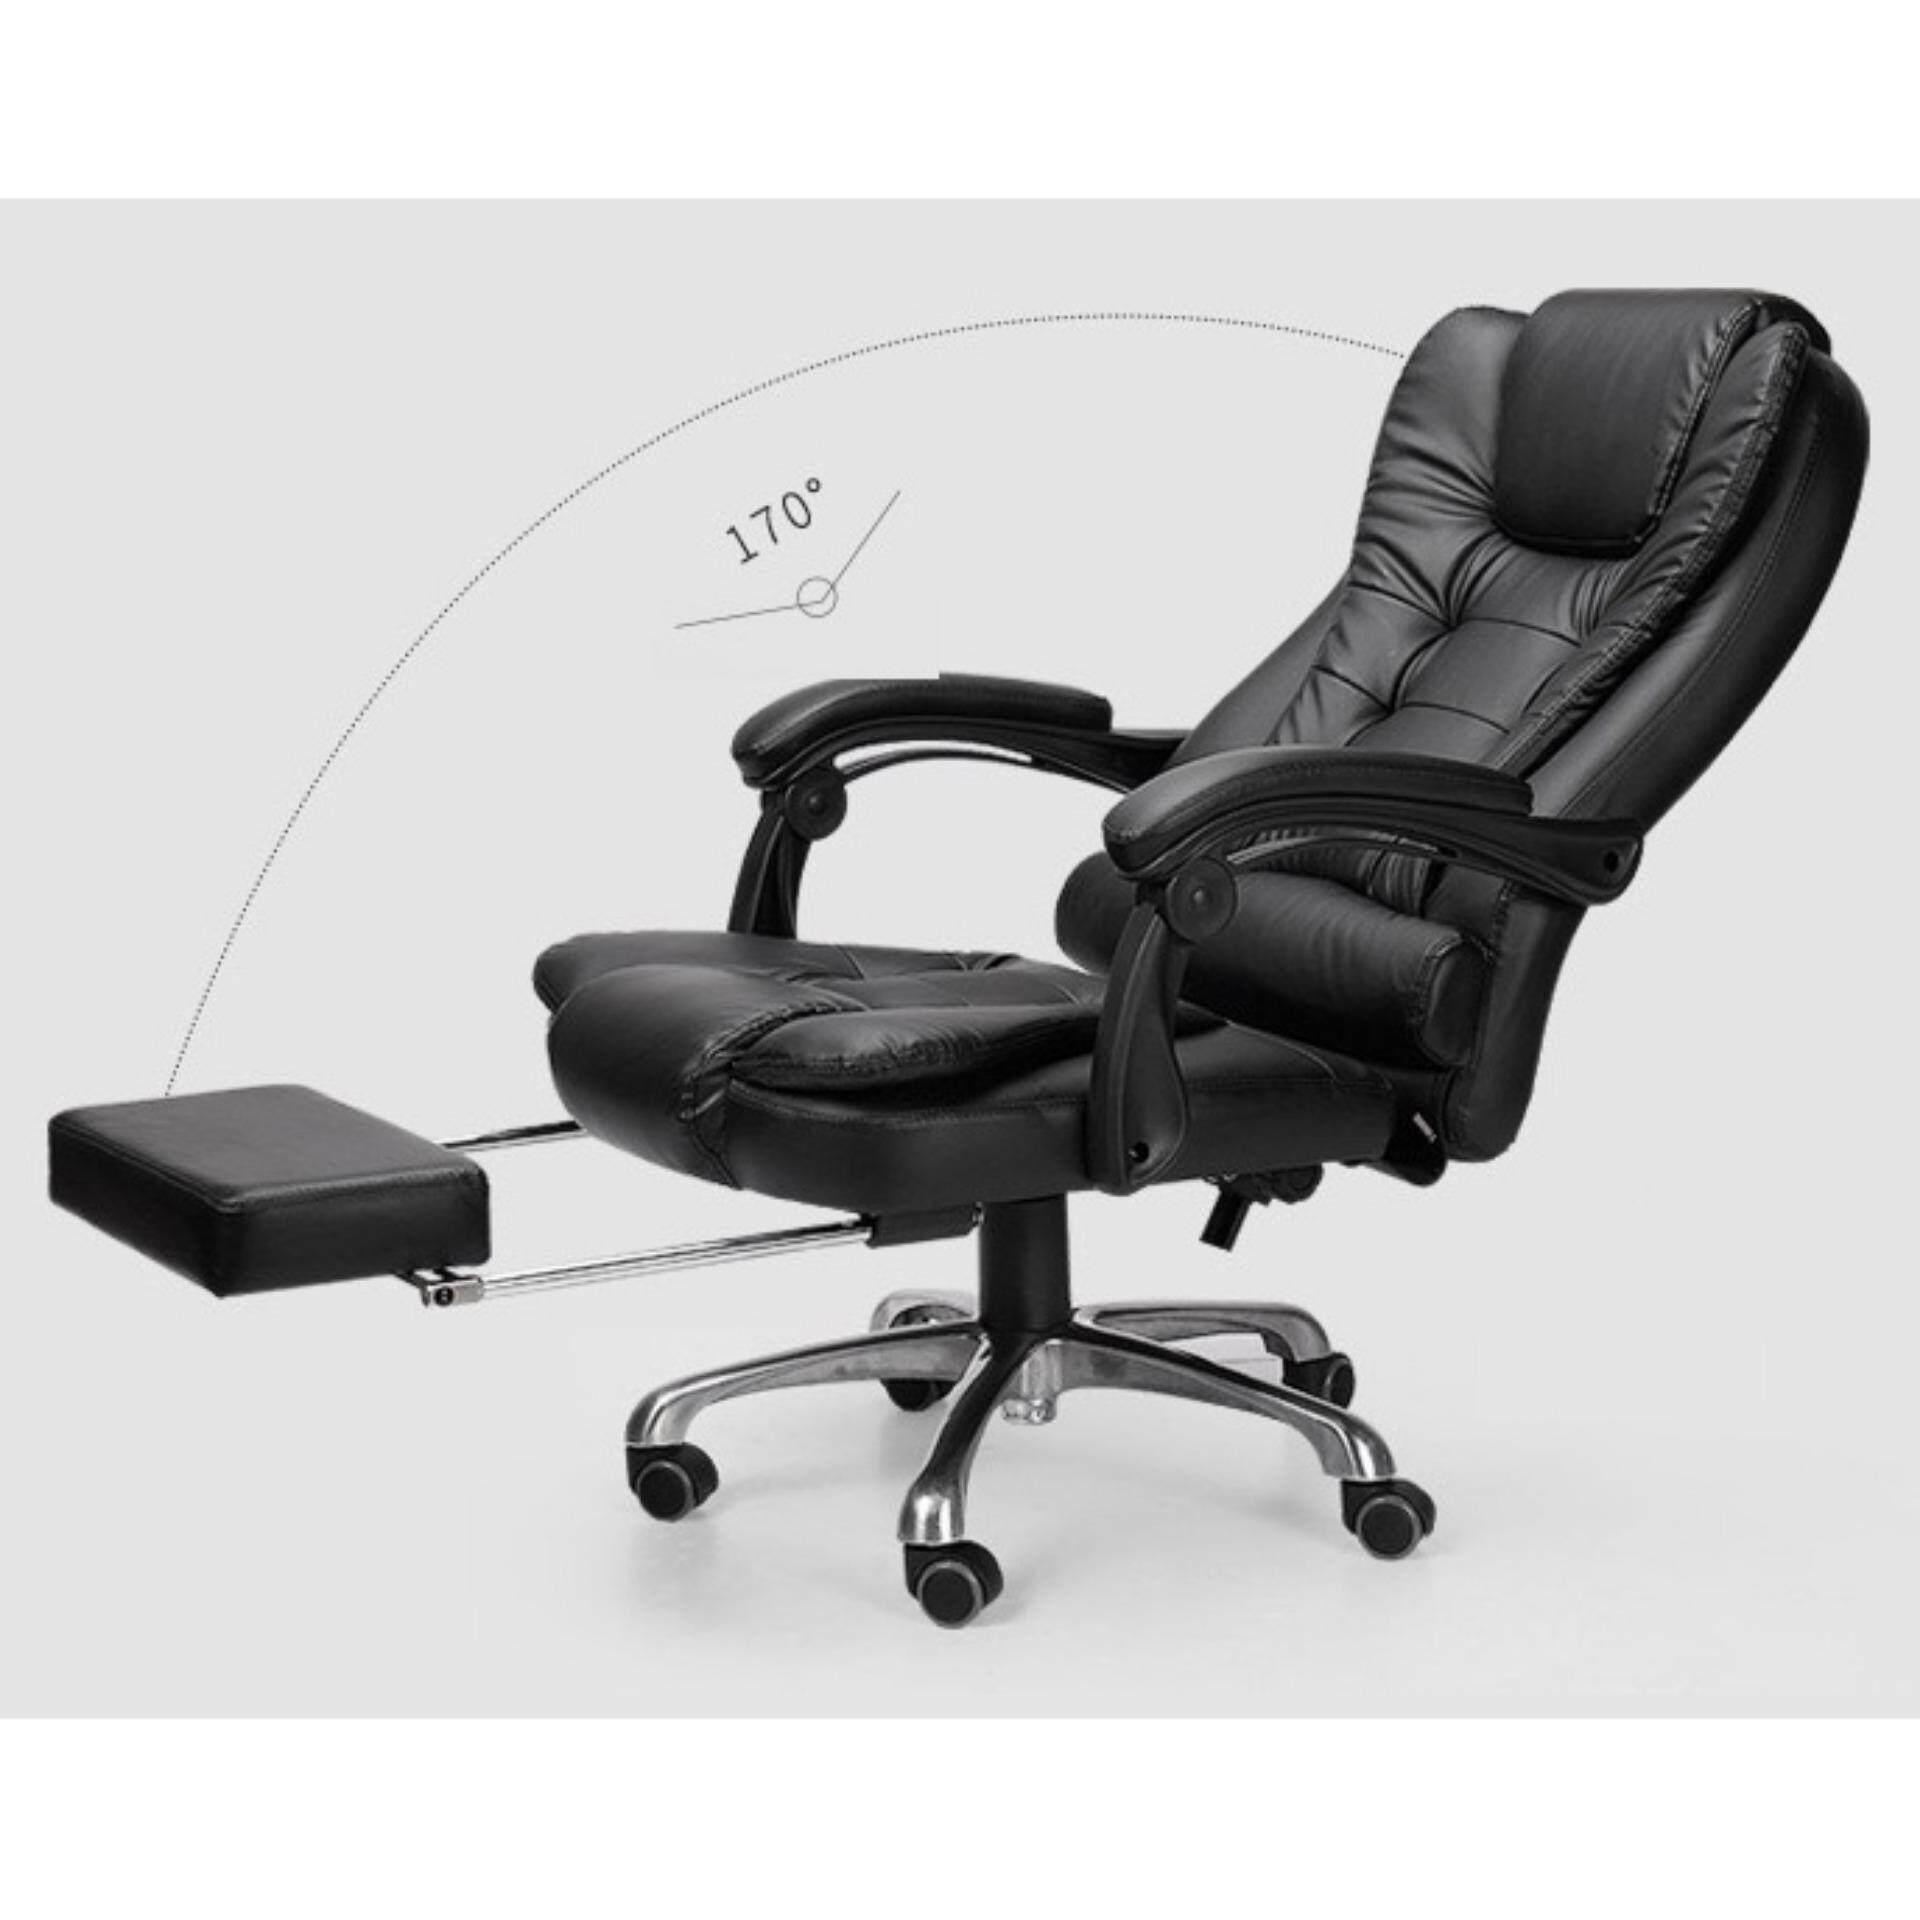 Corner Lvdouya Quality Professional Pu Lear Office Back Chair Boss Wheel Boss Chair Foot Rest 1507199558 27281479 9bbdebfd4ab69acb211d2cf6af7da88d furniture Sofa Chair With Leg Rest